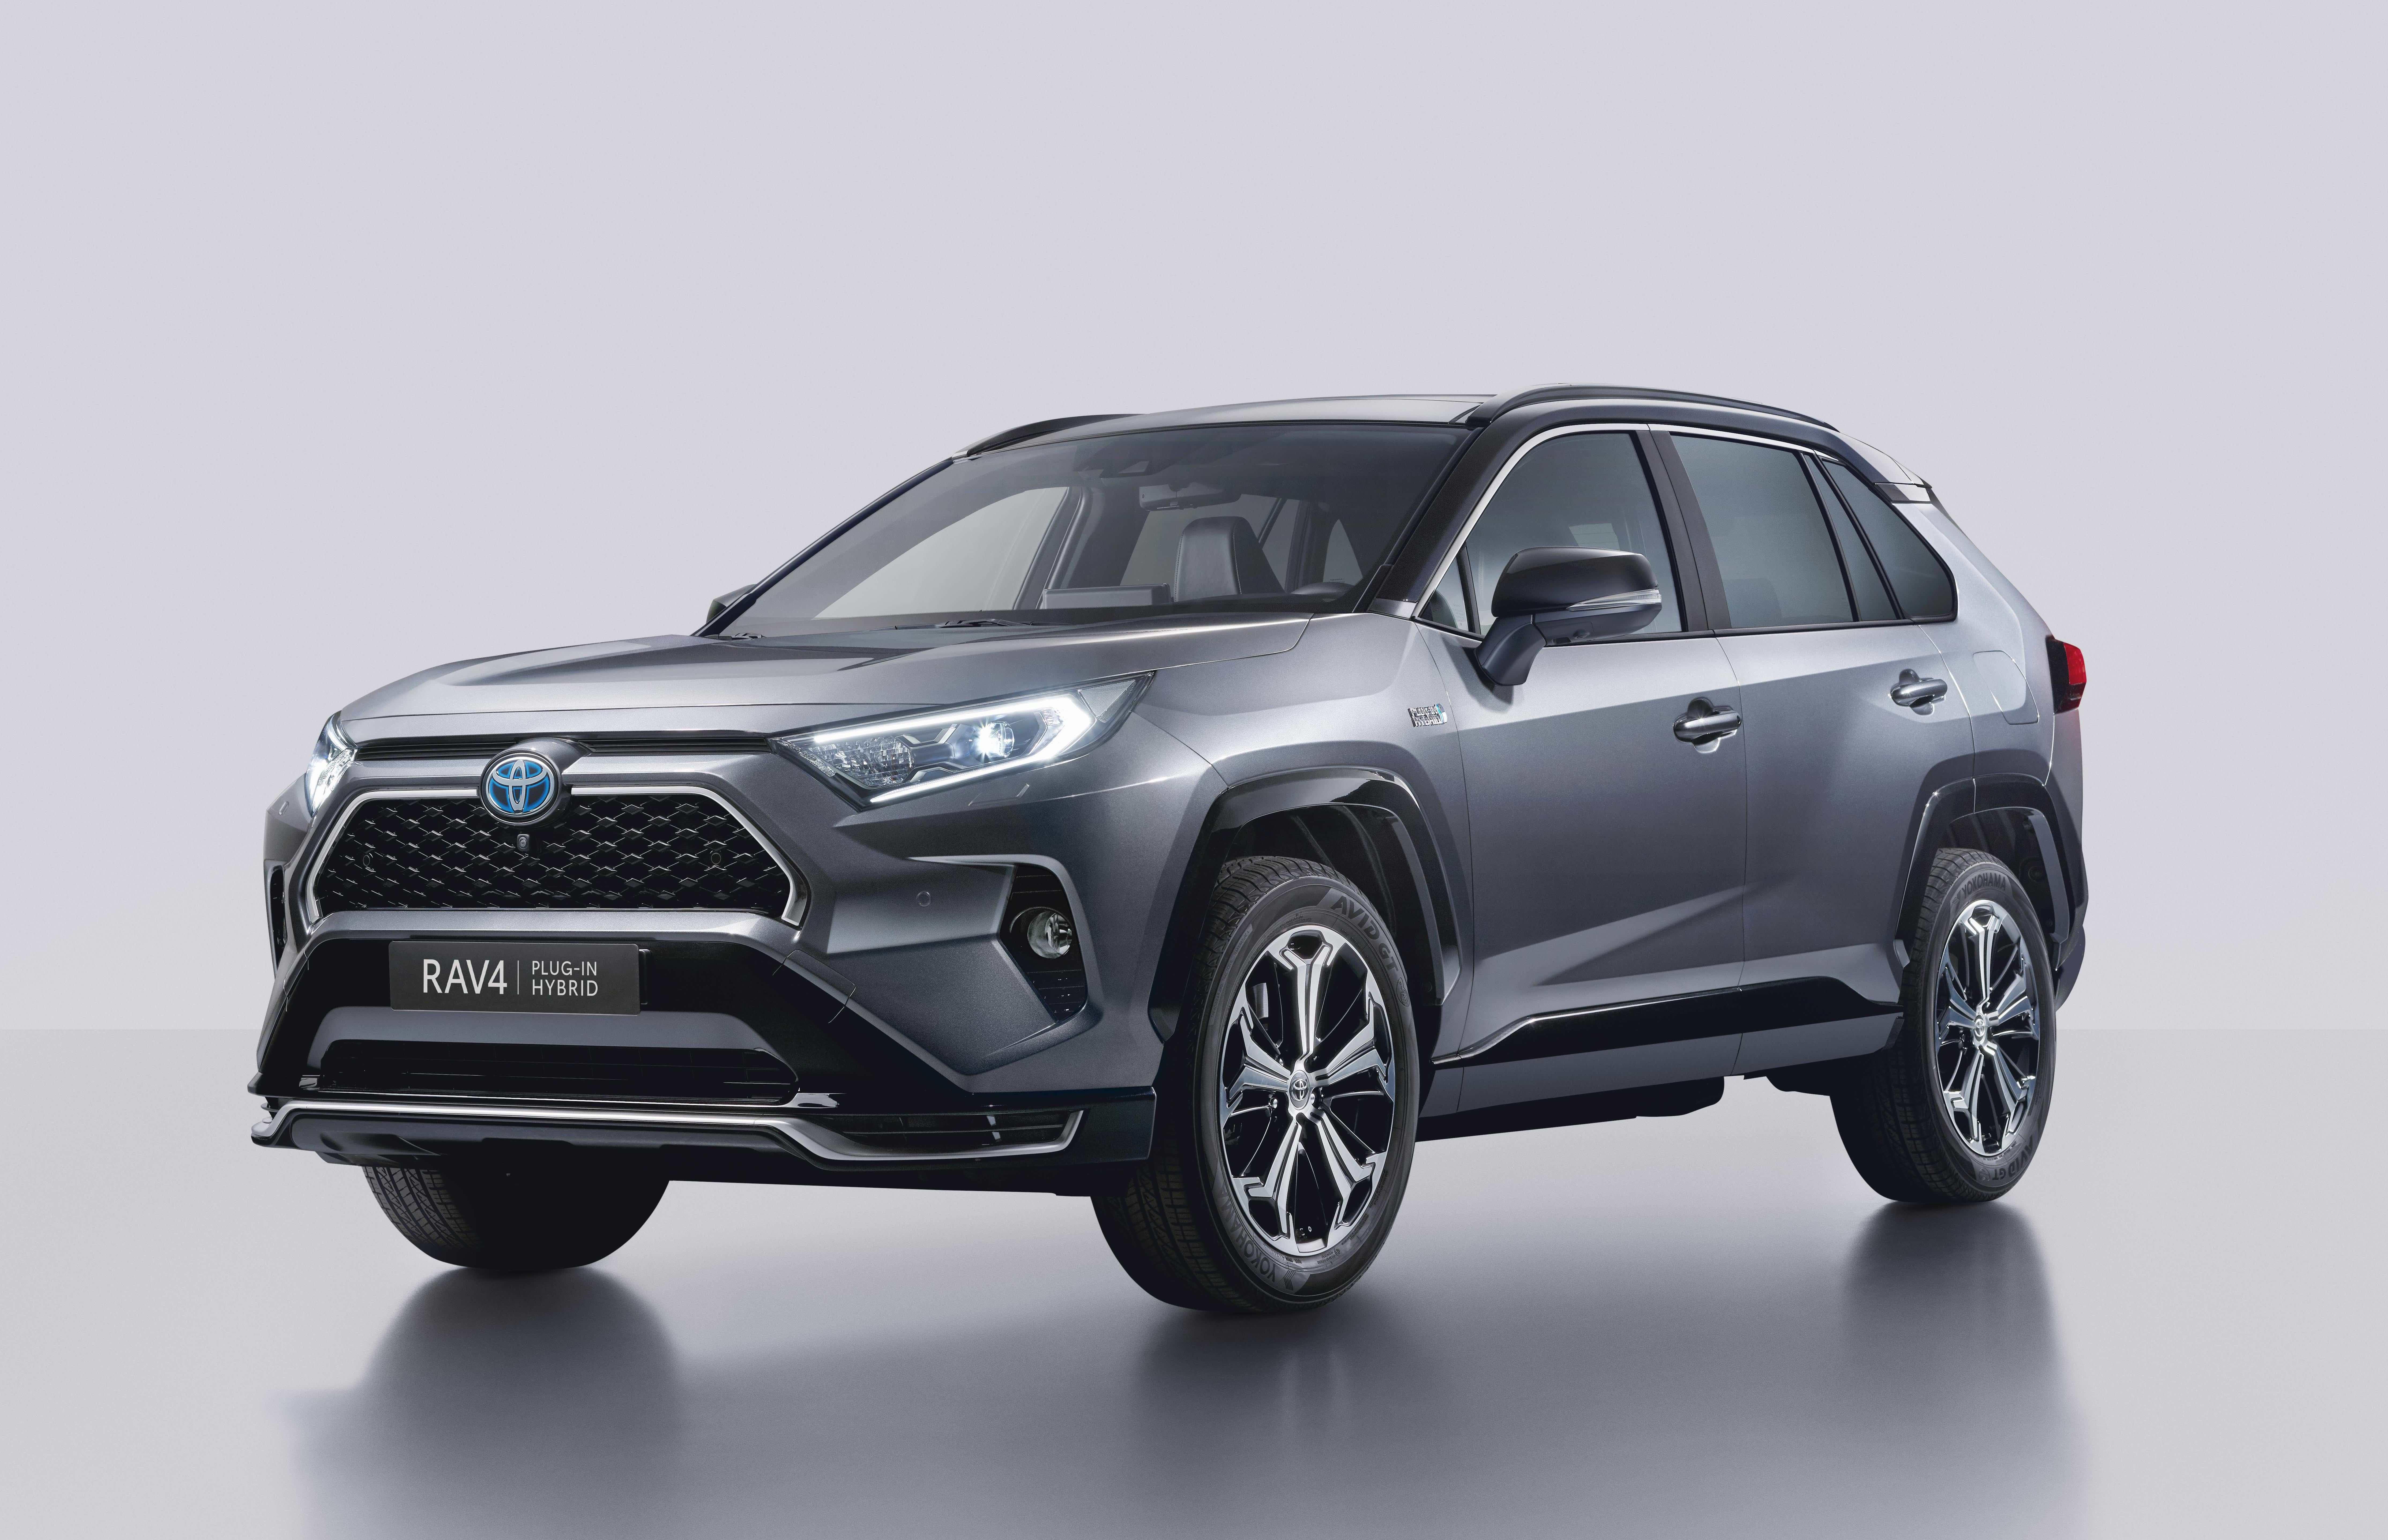 RAV4 plug-in hybrid becomes Toyota's new flagship